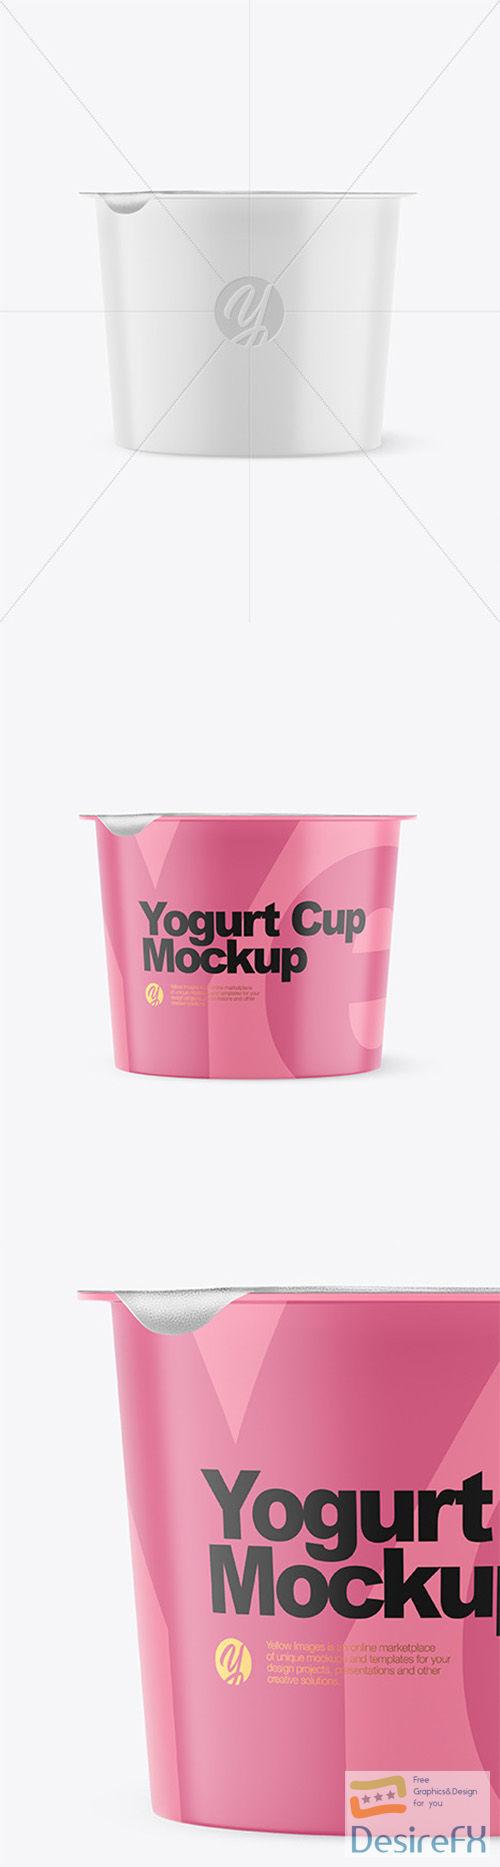 Matte Plastic Yogurt Cup With Foil Lid Mockup - Front View 66340